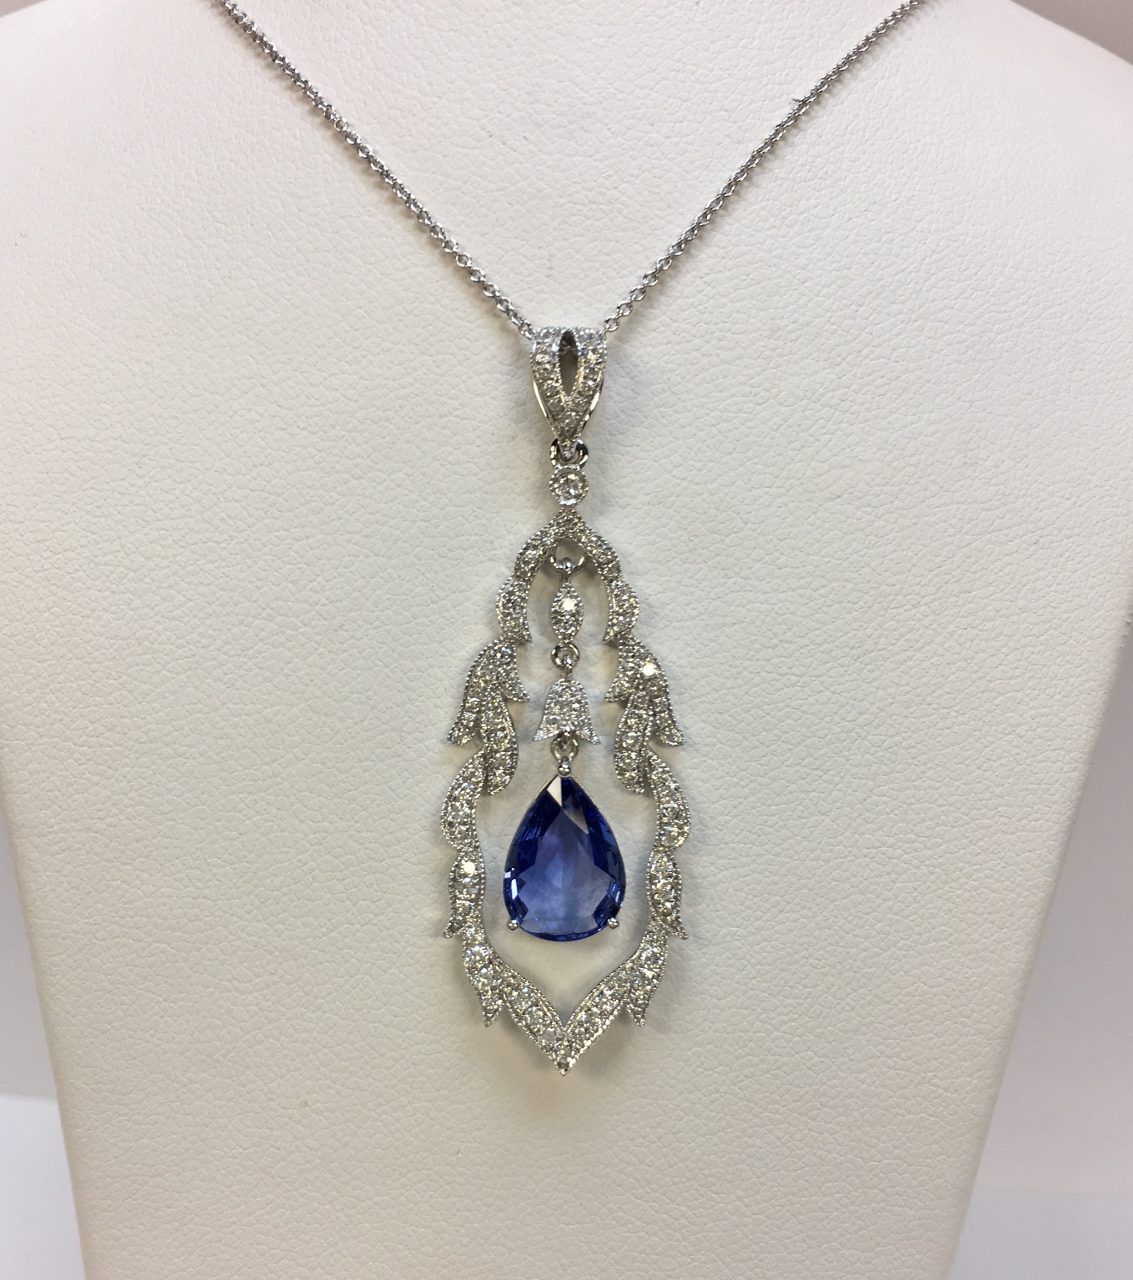 2 Carats Sapphire Diamond Pendant